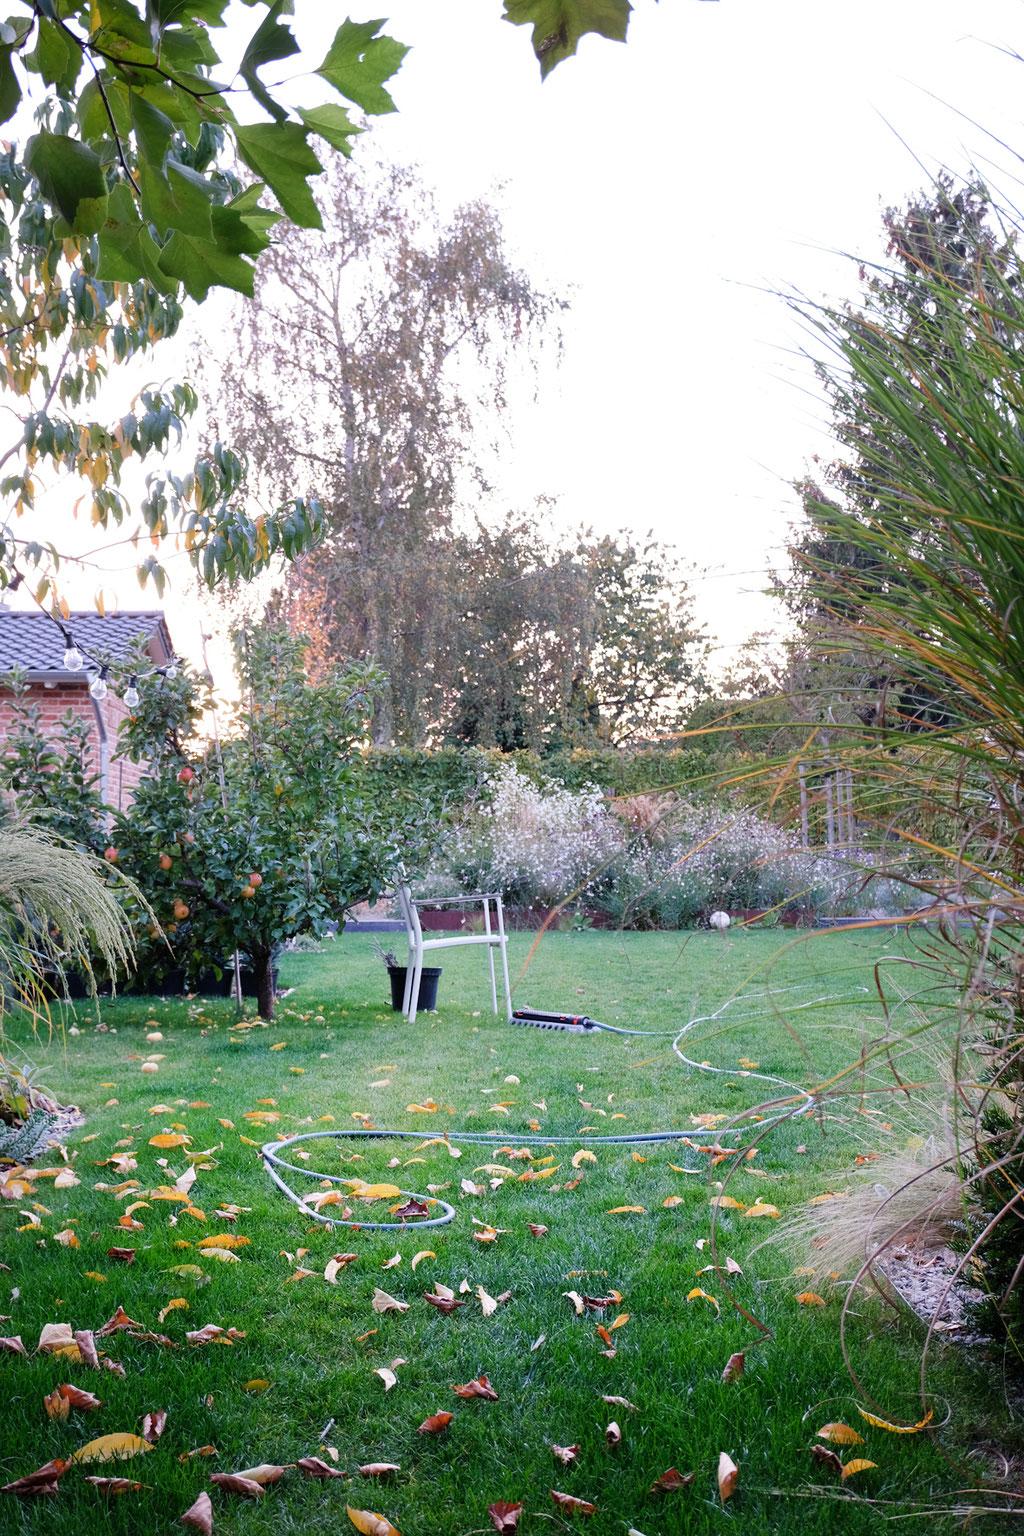 dieartigeGARTEN - Oktobergarten | Gartenblick gen Westen